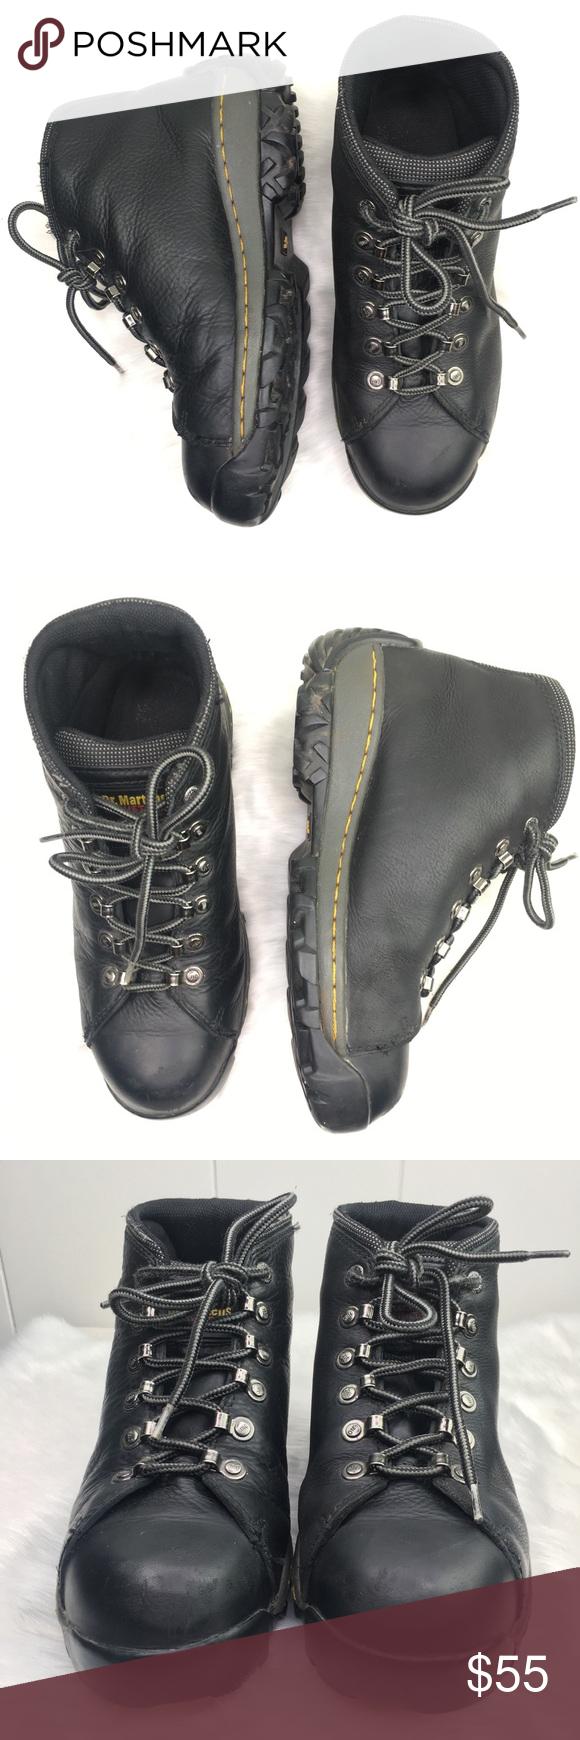 Dr. Martens industrial steel toe safety shoe boot Dr